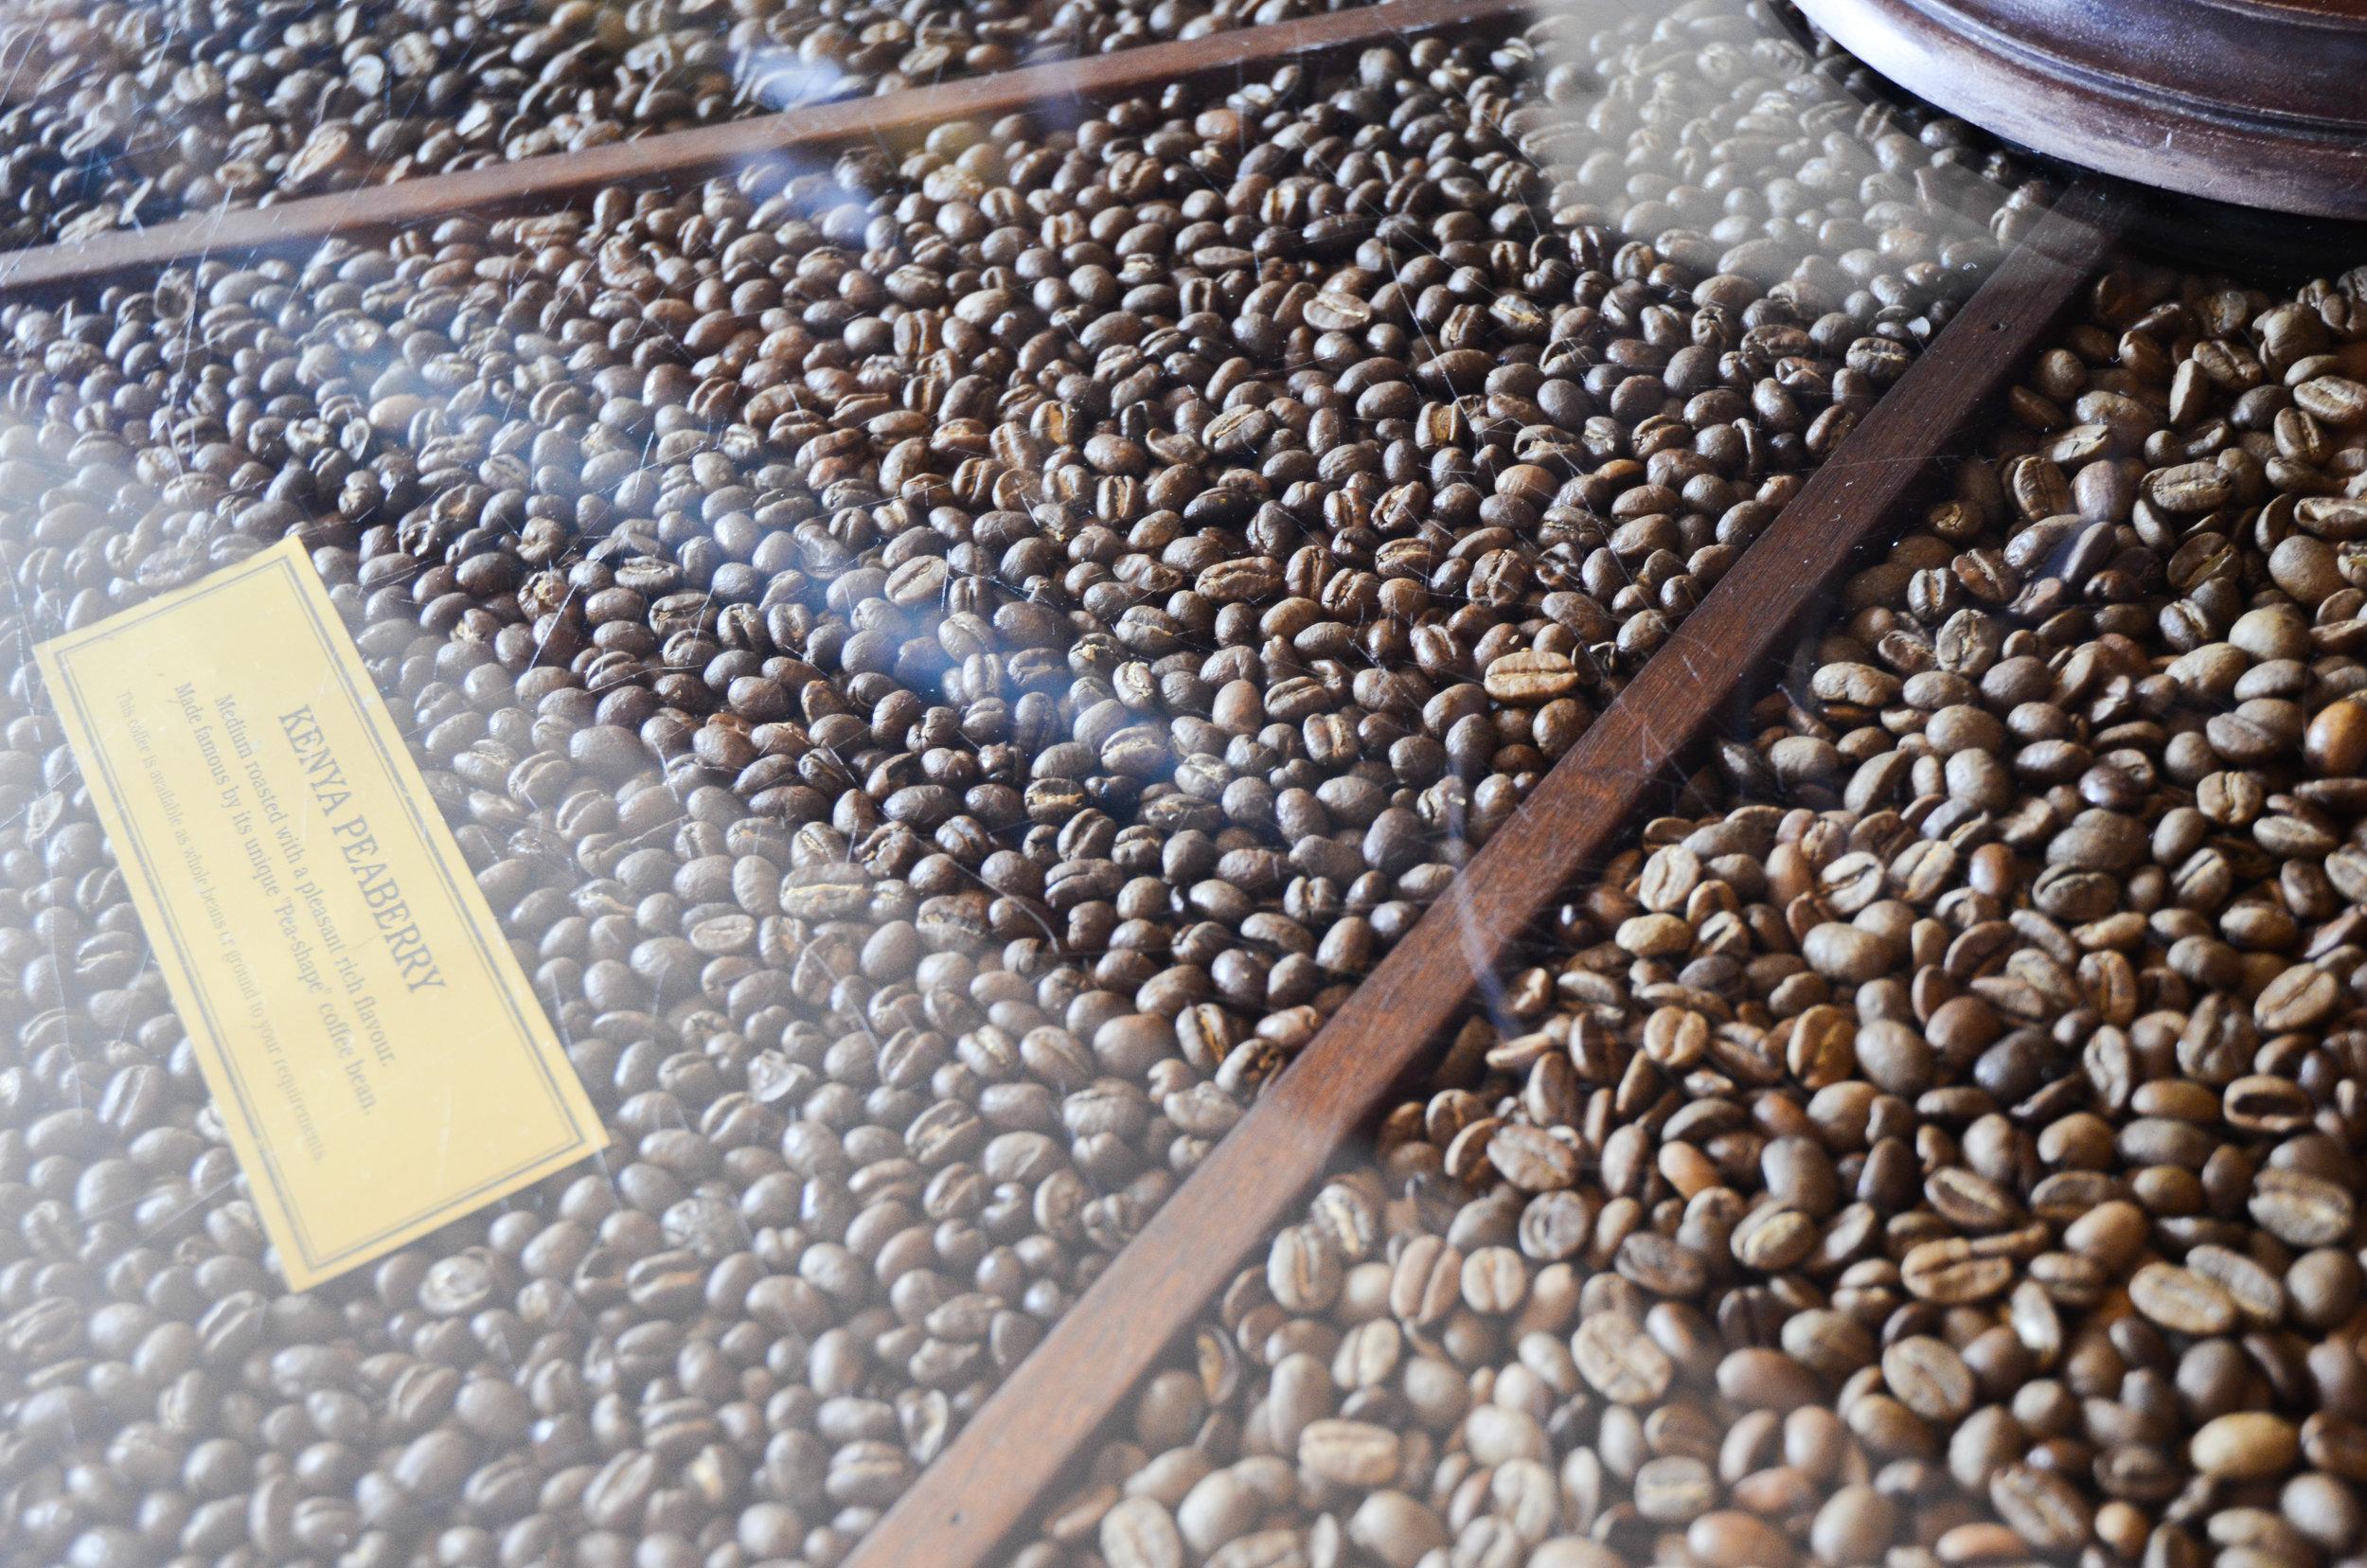 coffee-table_14335909960_o.jpg